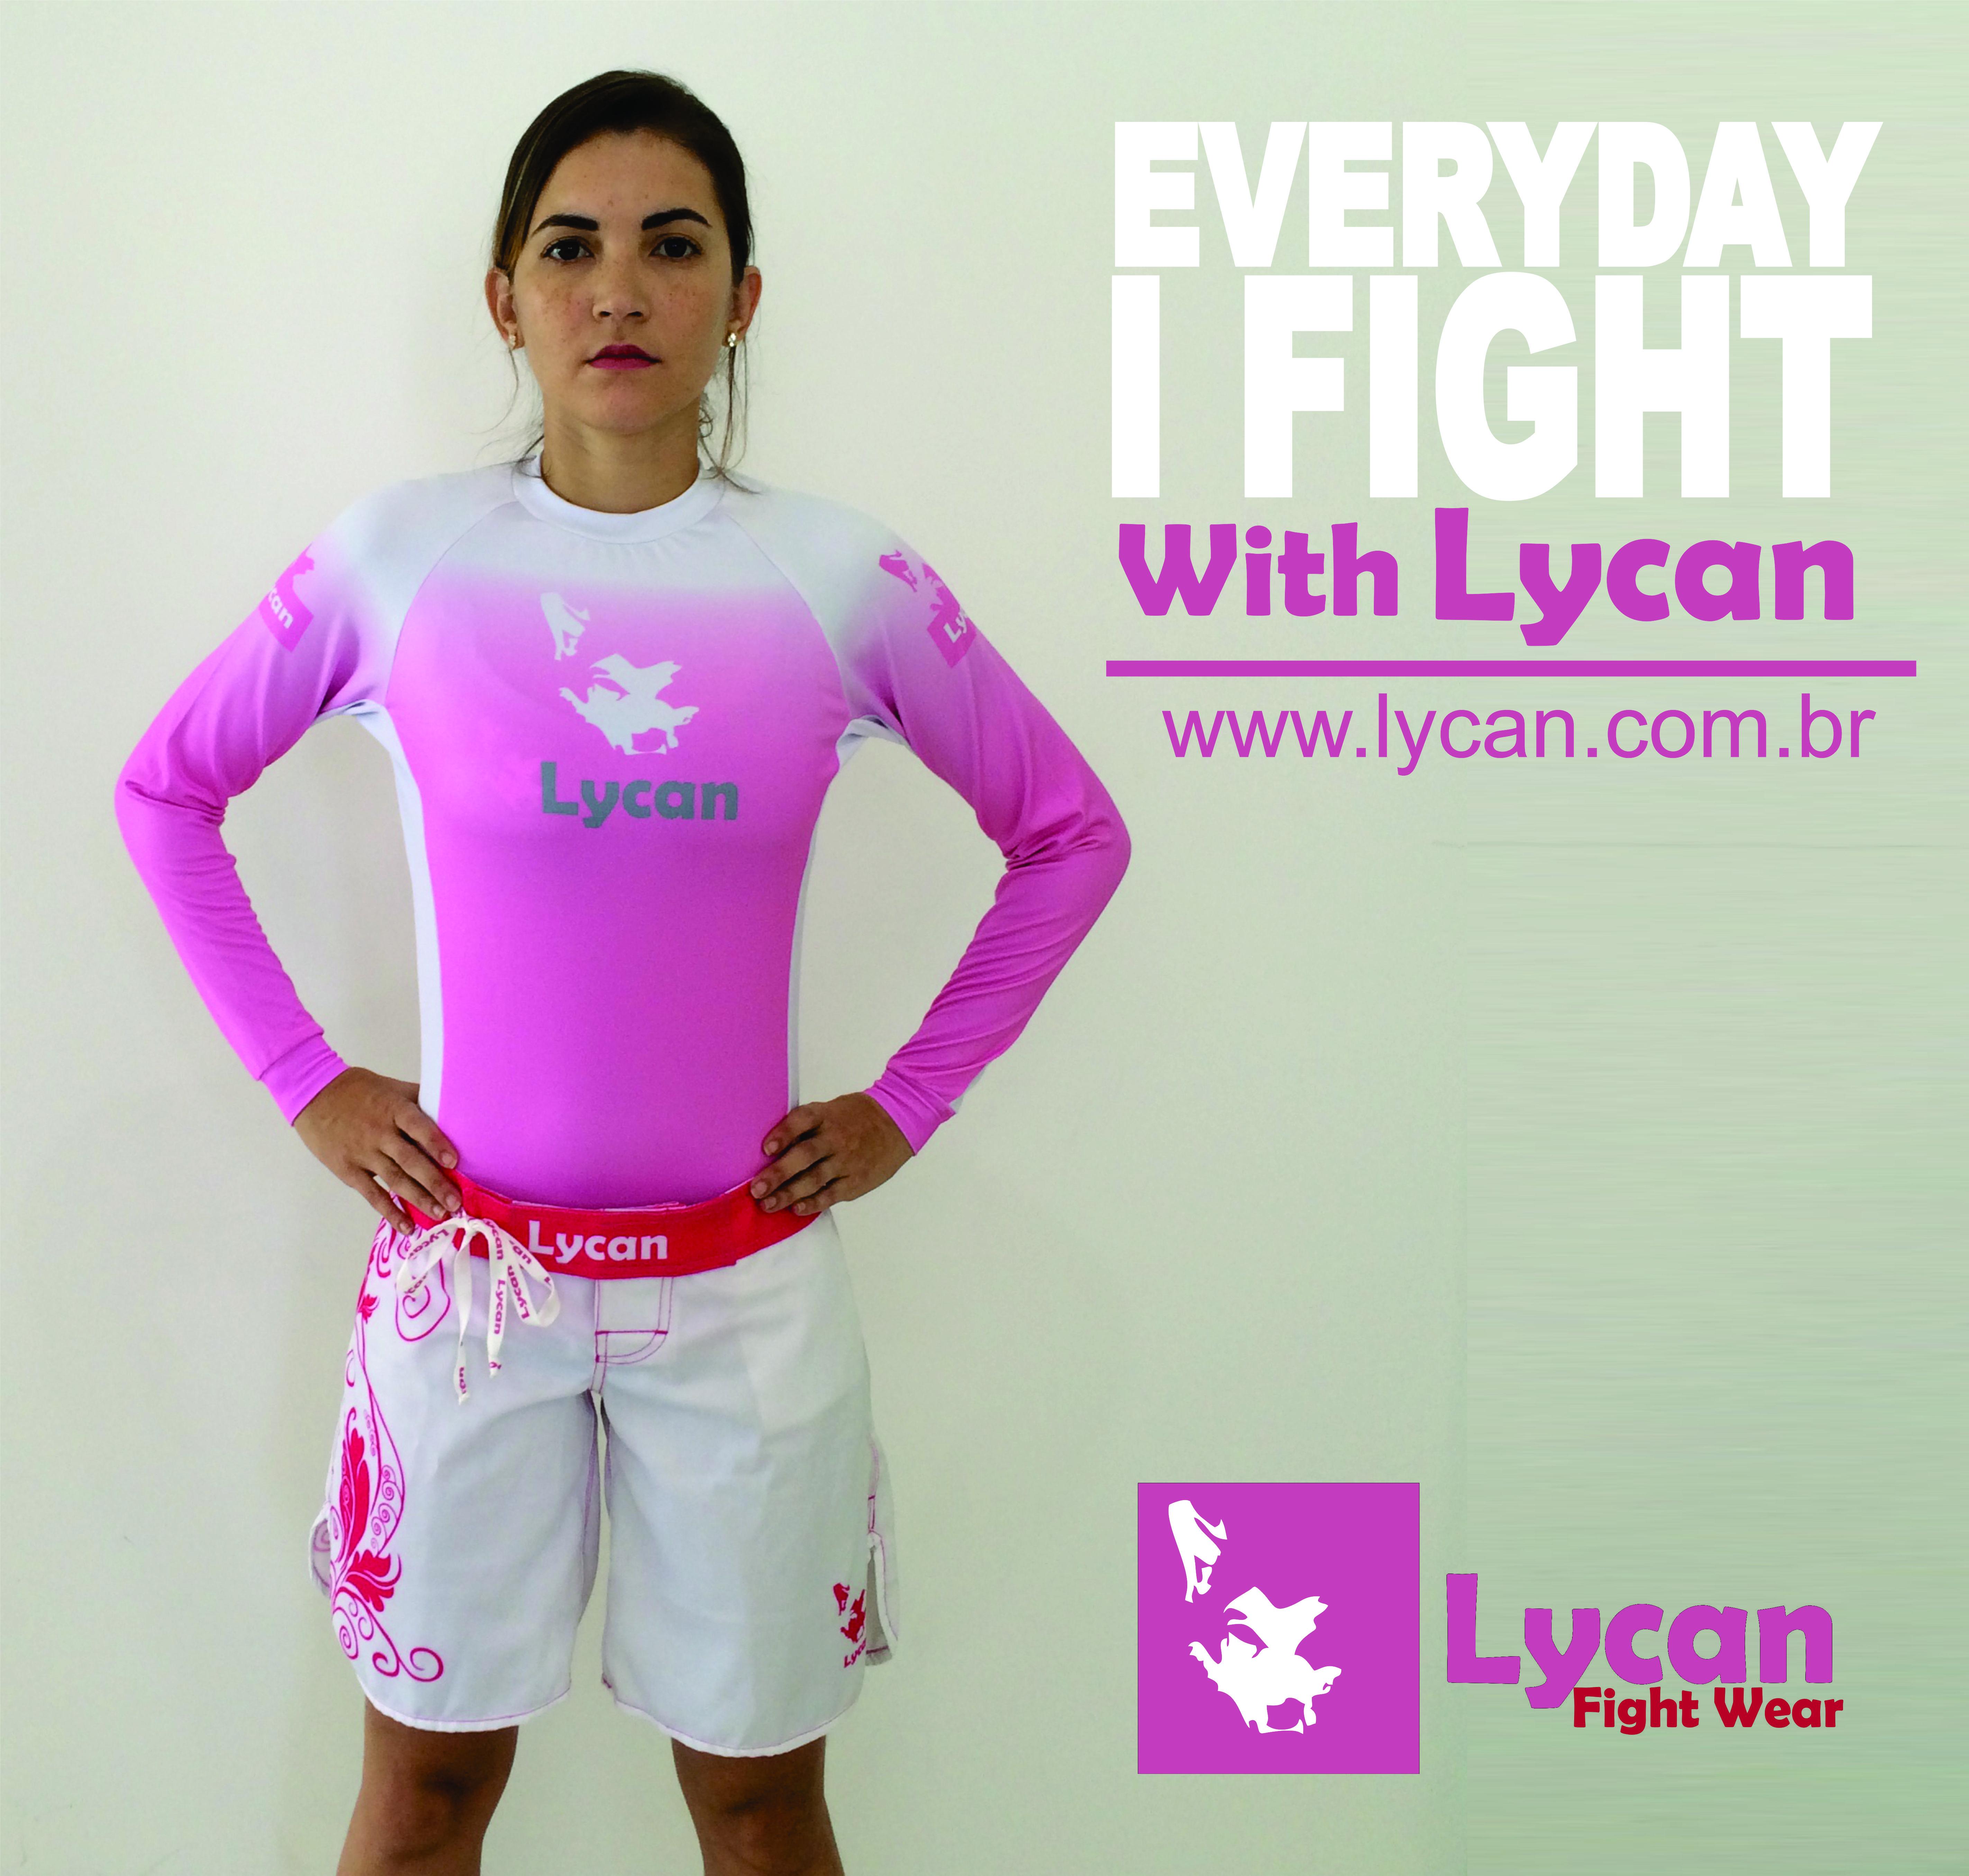 Every Day I Fight With Lycan! #LycanFightWear #RashGuard #FightWear #NoGi